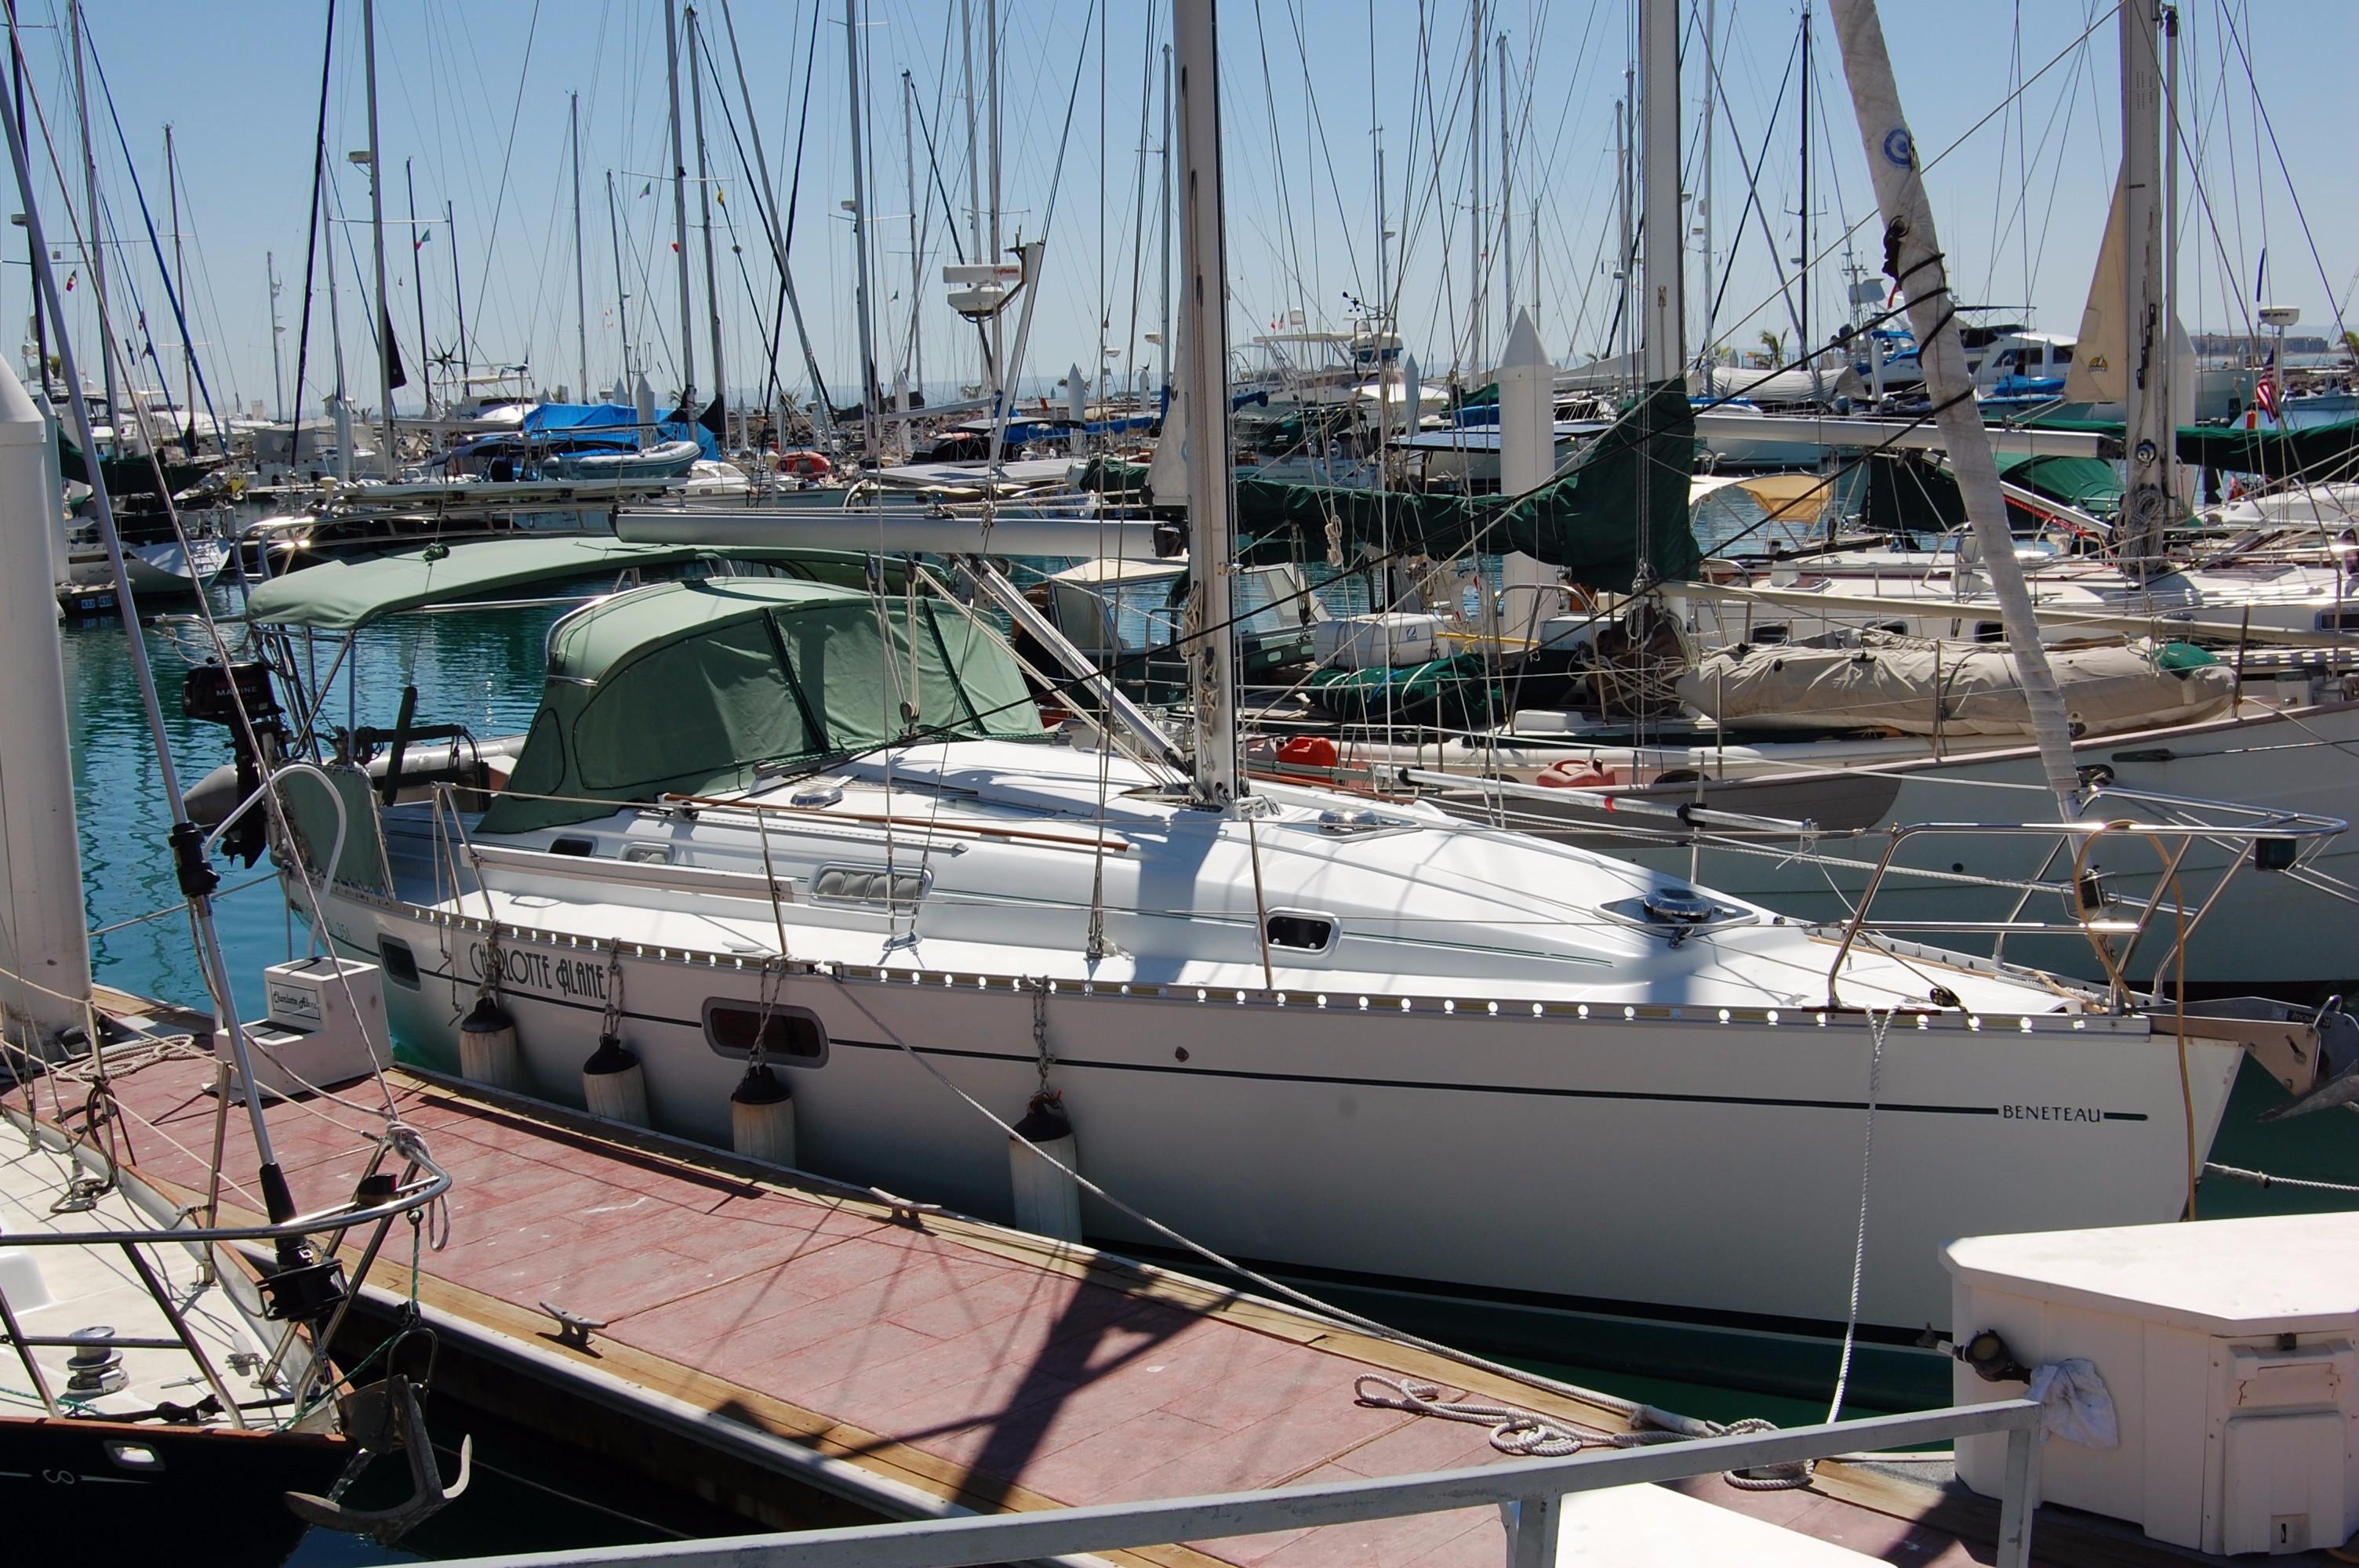 35' Beneteau Oceanis 351+Boat for sale!